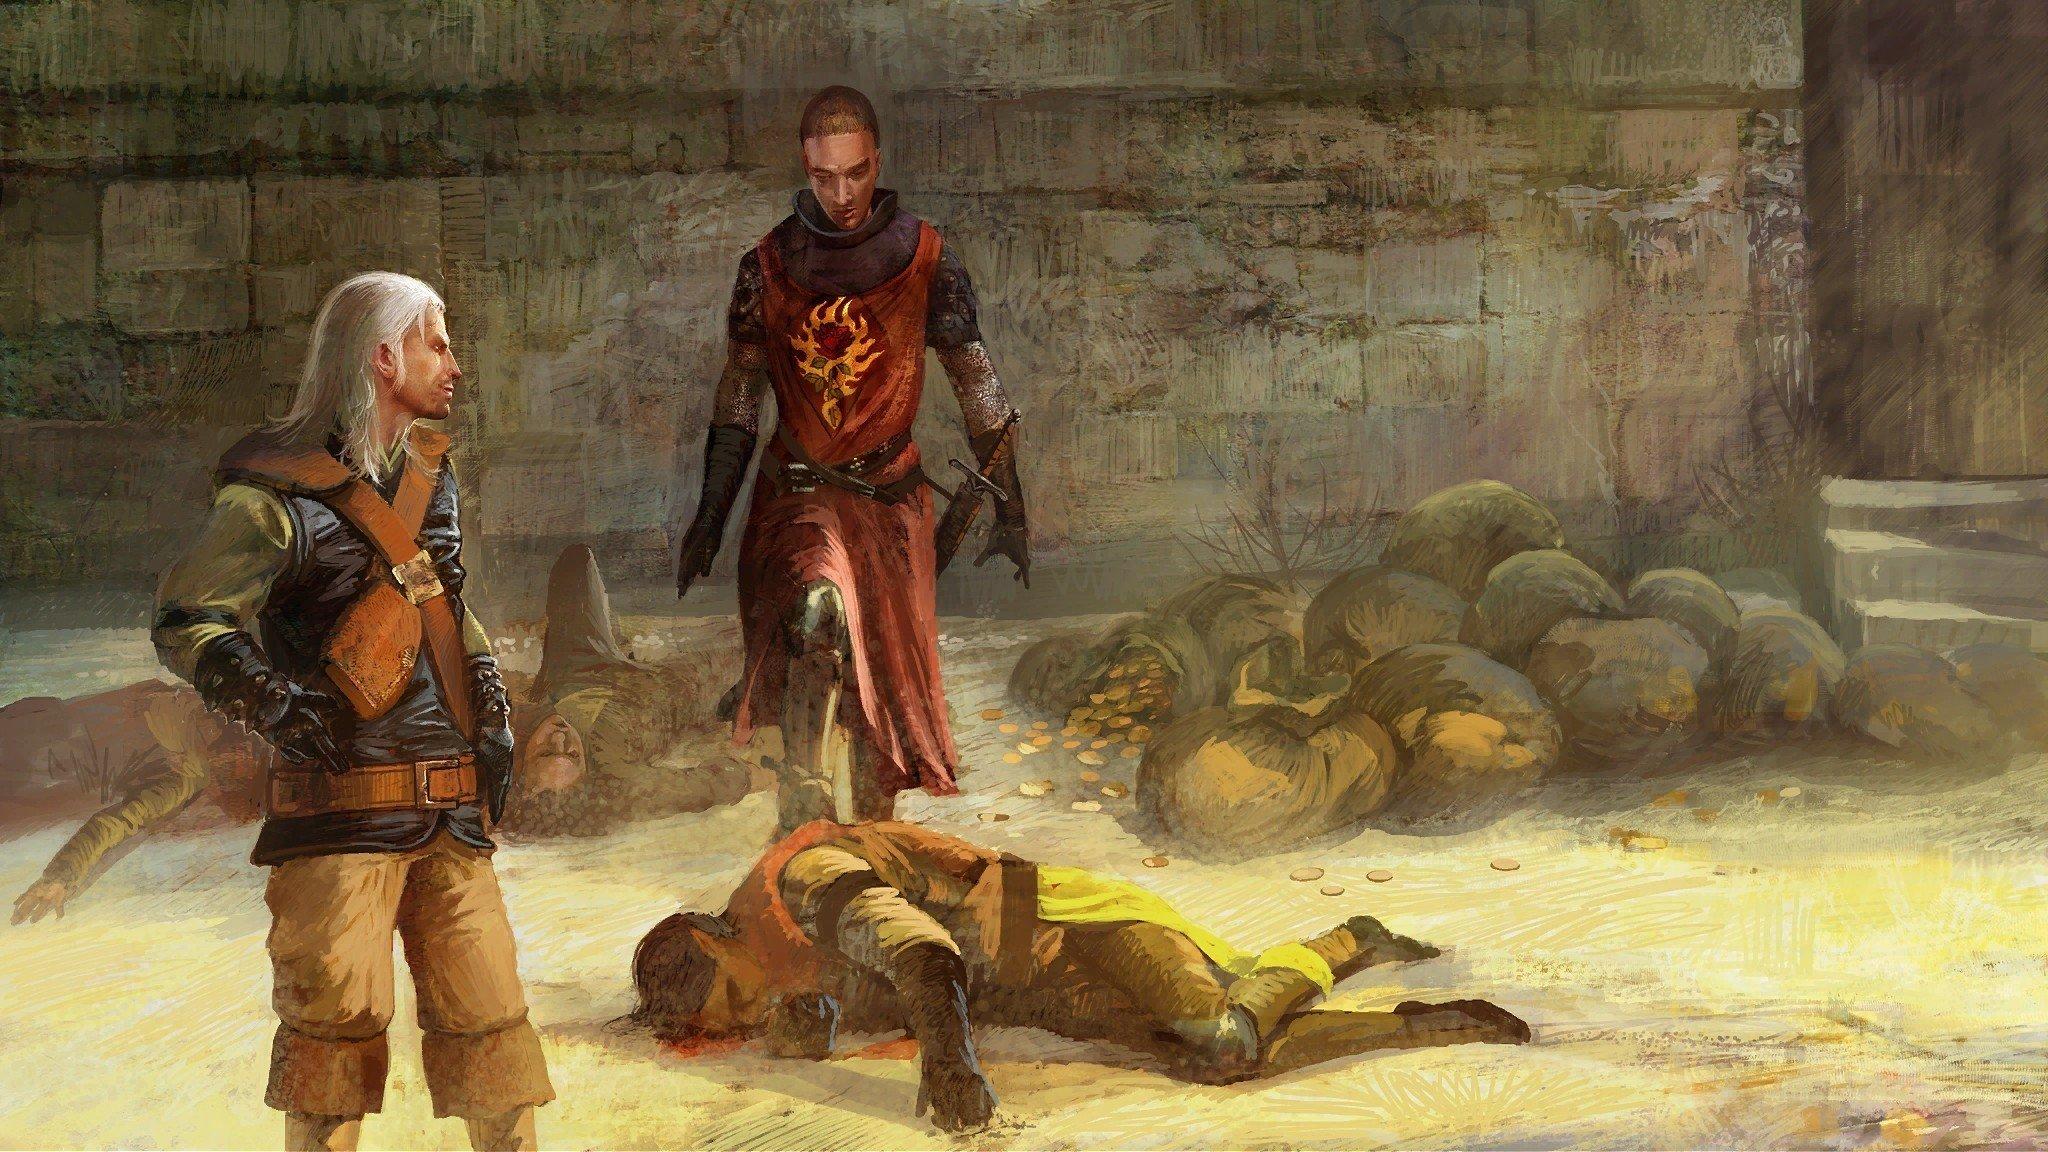 Video Games Rpg The Witcher Fantasy Art Artbook Artwork Geralt Of Rivia The Witcher 2 Assassins Of Kings Swords Anjey Sapkovsky Pc Games Wallpaper 2048x1152 293608 Wallpaperup